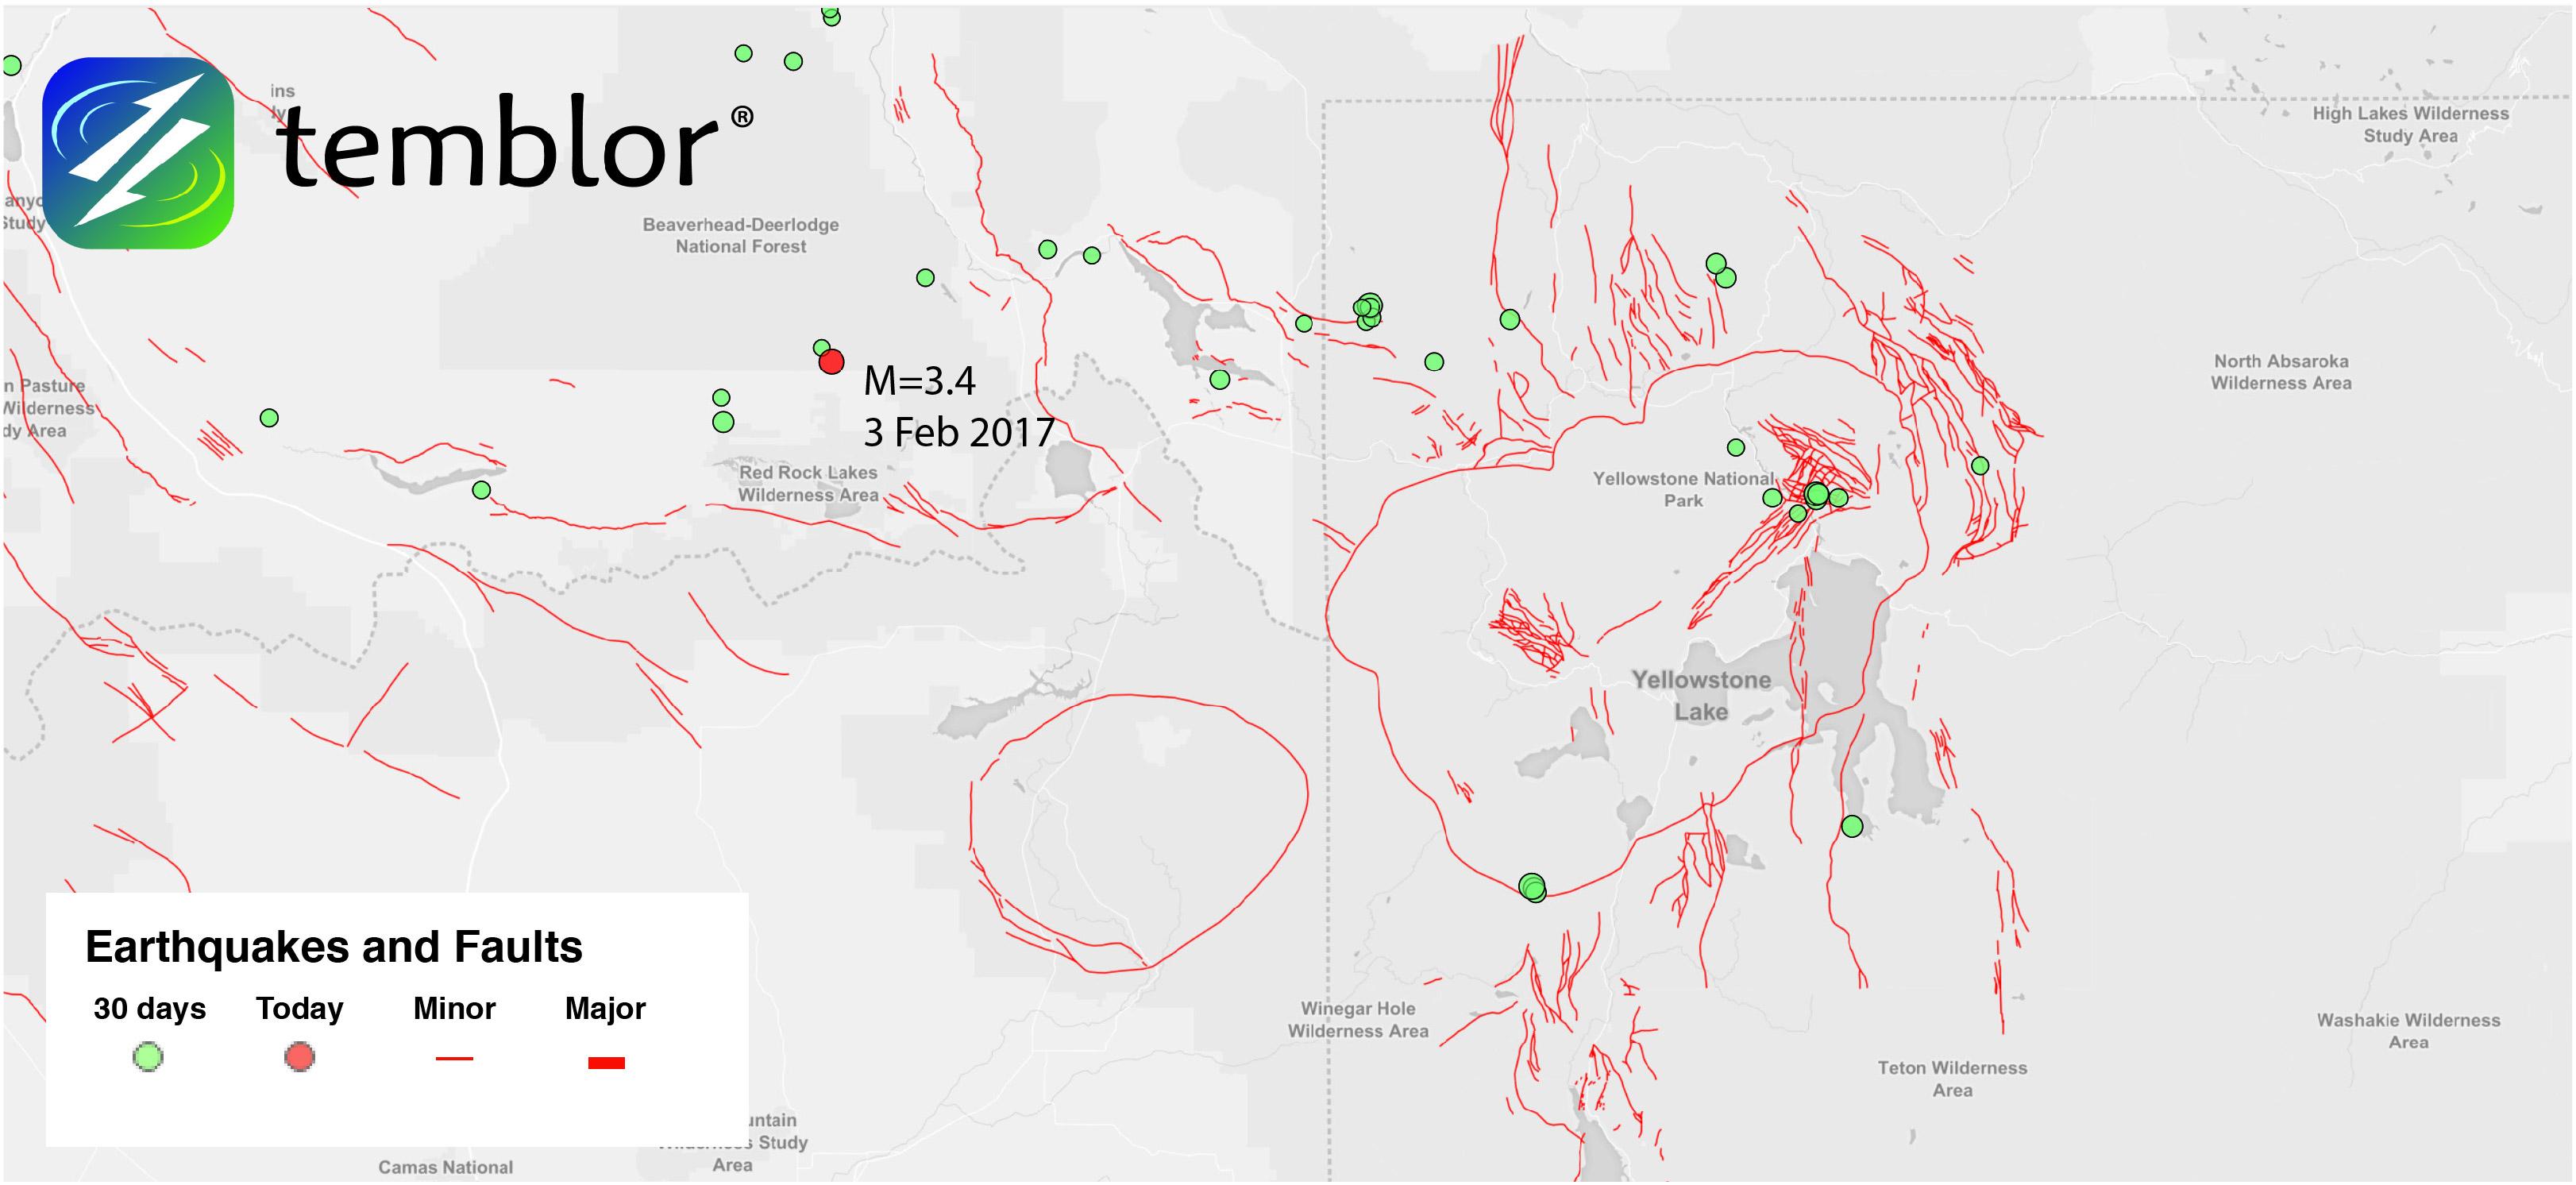 idaho-earthquake-map-yellowstone-national-park-earthquakes – Temblor.net